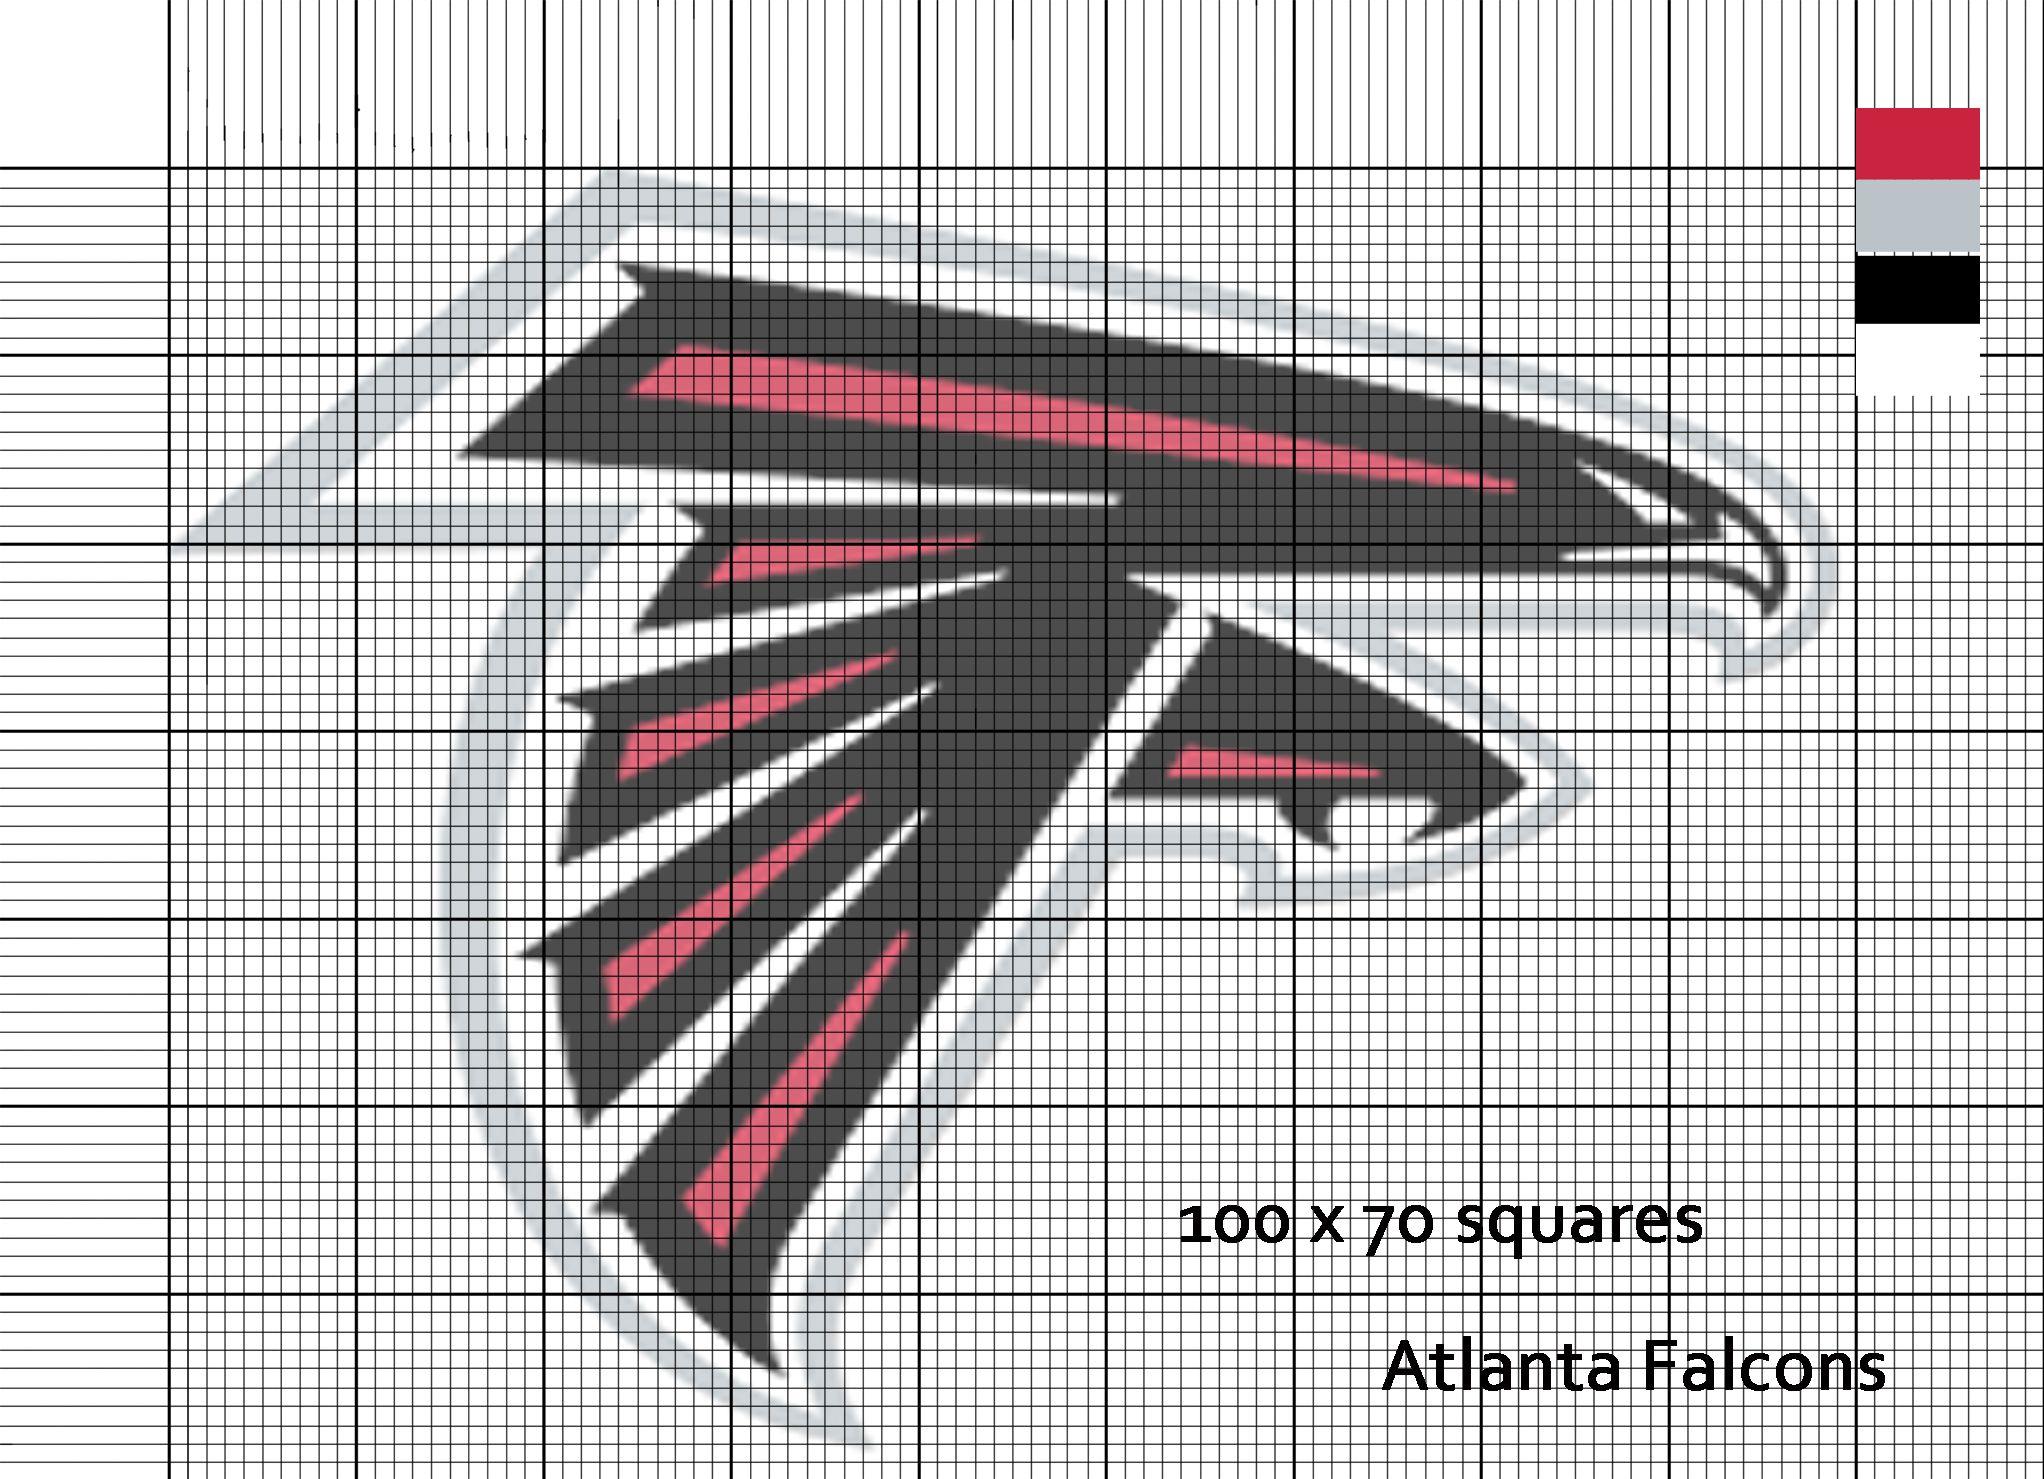 Atlanta Falcons Nfl Logo Cross Stitch Pattern Cross Stitch Patterns Cross Stitching Crochet Blanket Patterns